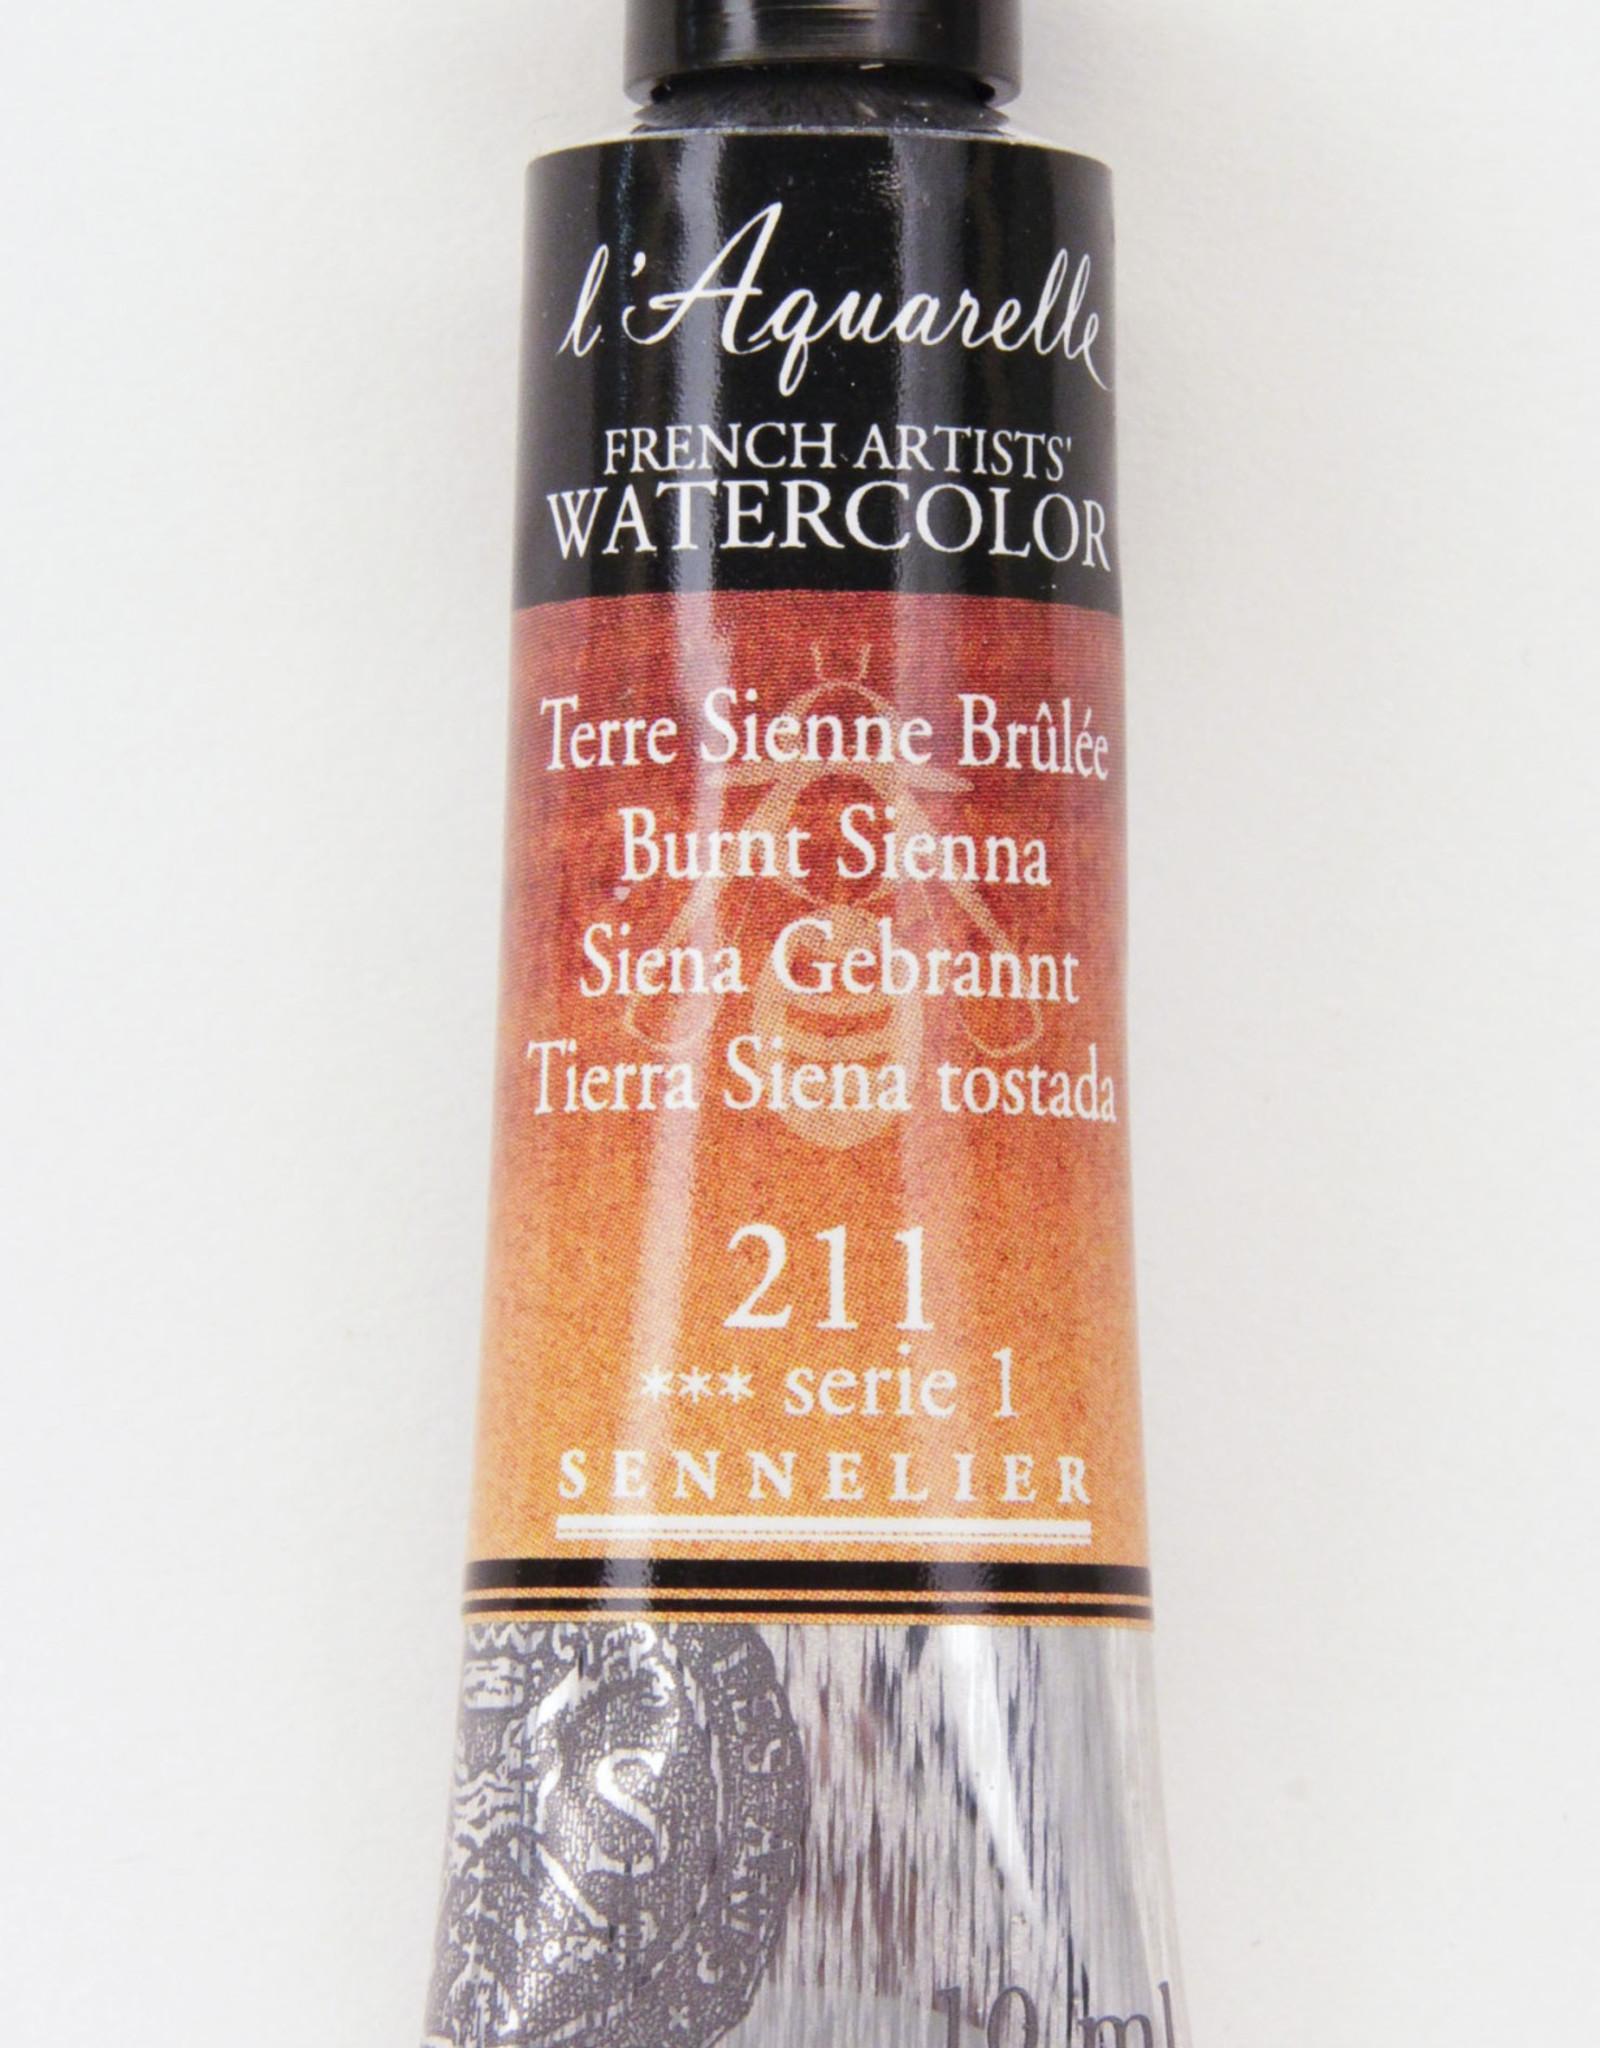 Sennelier, Aquarelle Watercolor Paint, Burnt Sienna, 211,10ml Tube, Series 1